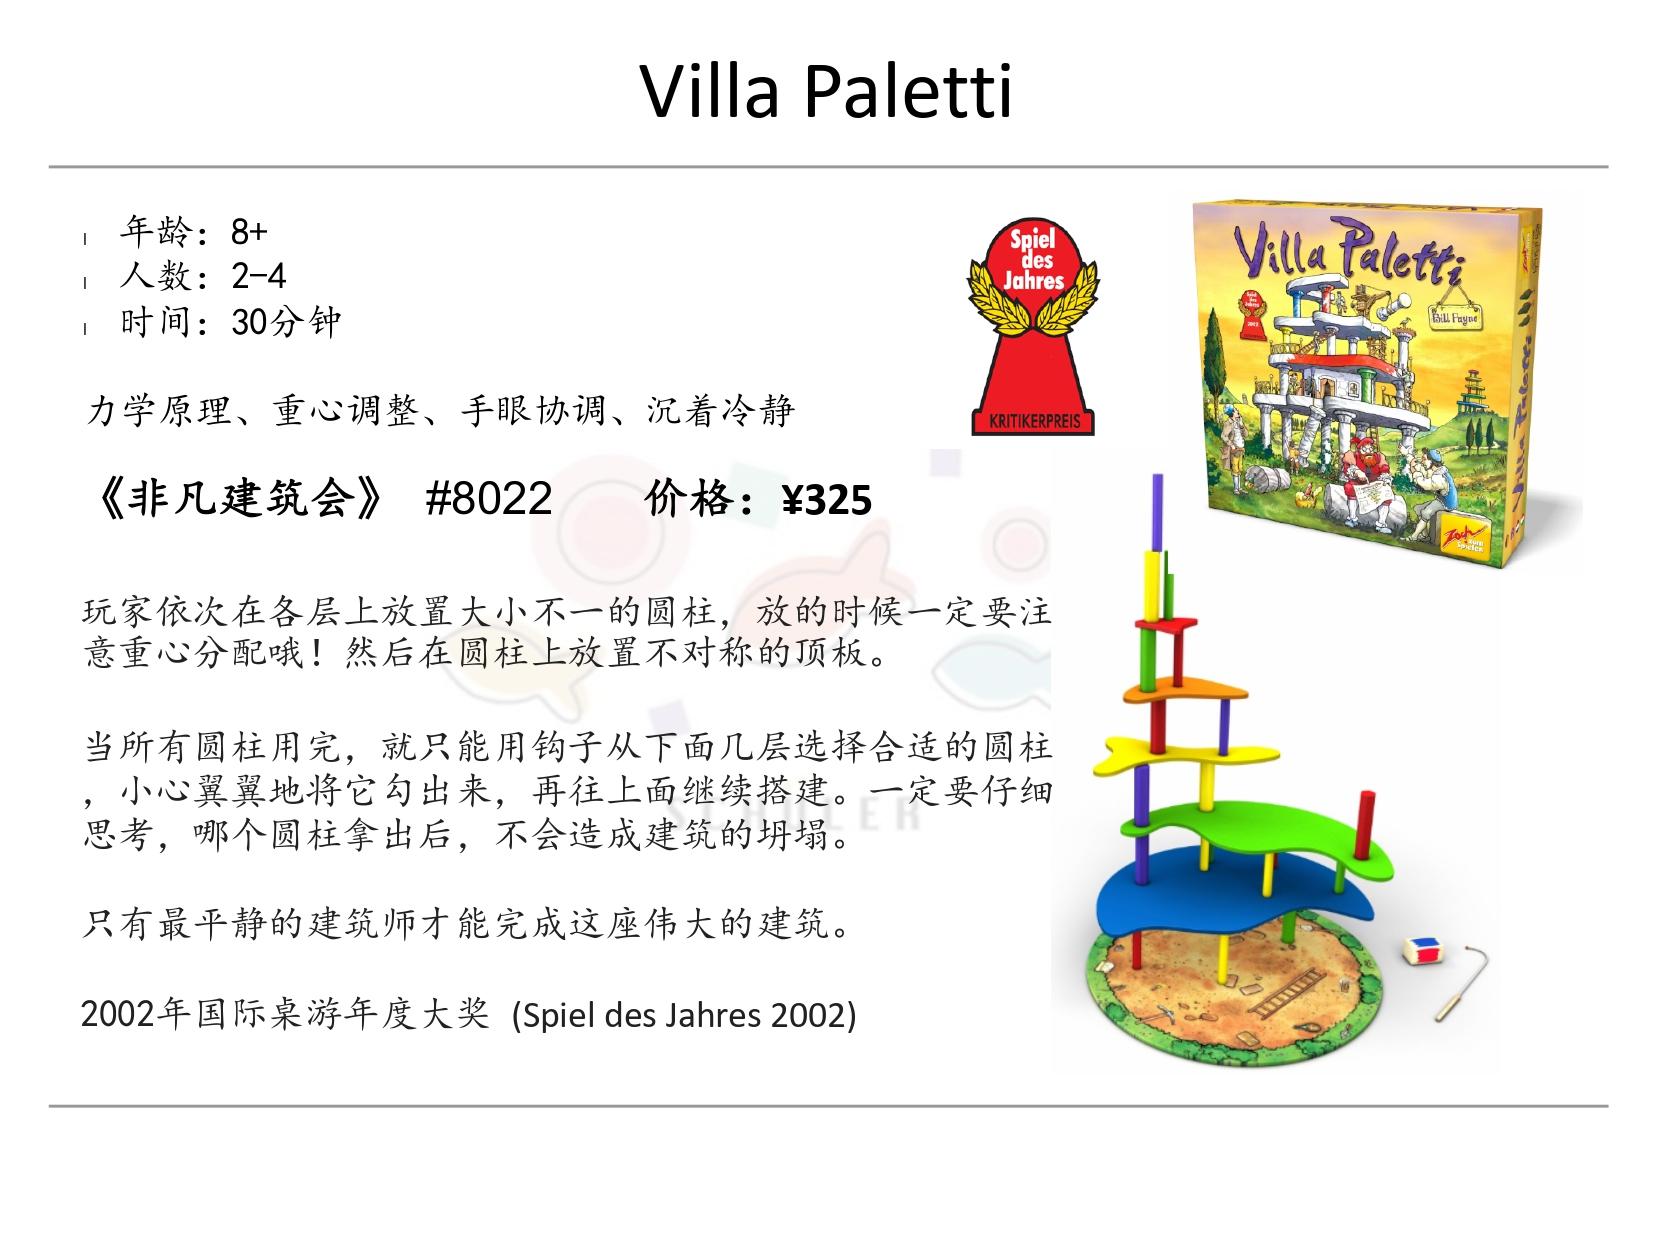 Villa Paletti 非凡建筑会